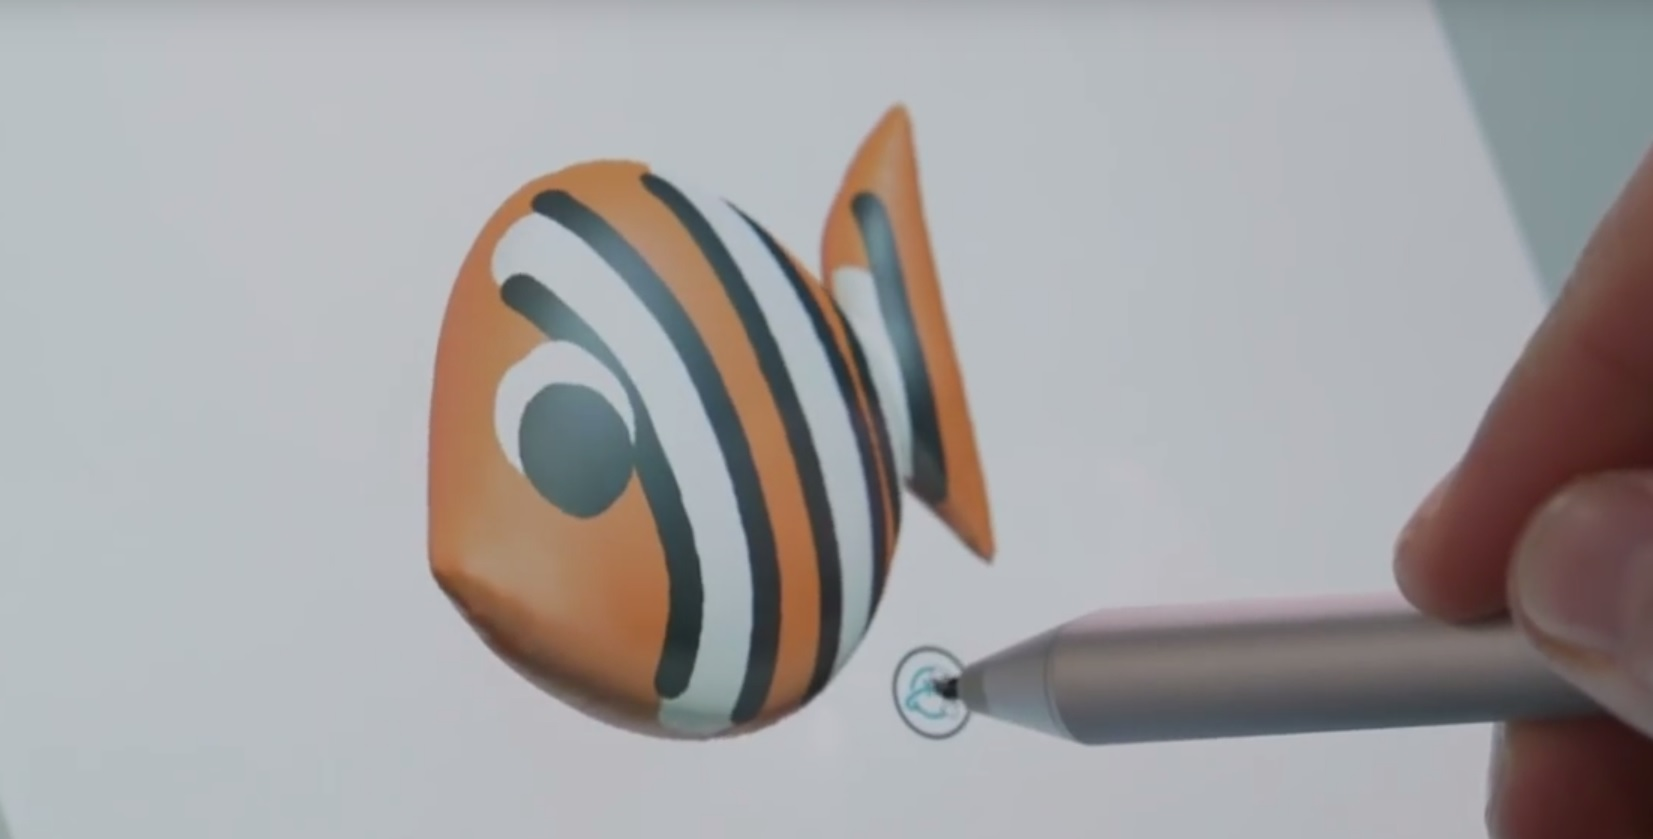 microsoft-paint-budet-risovat-v-3d-1